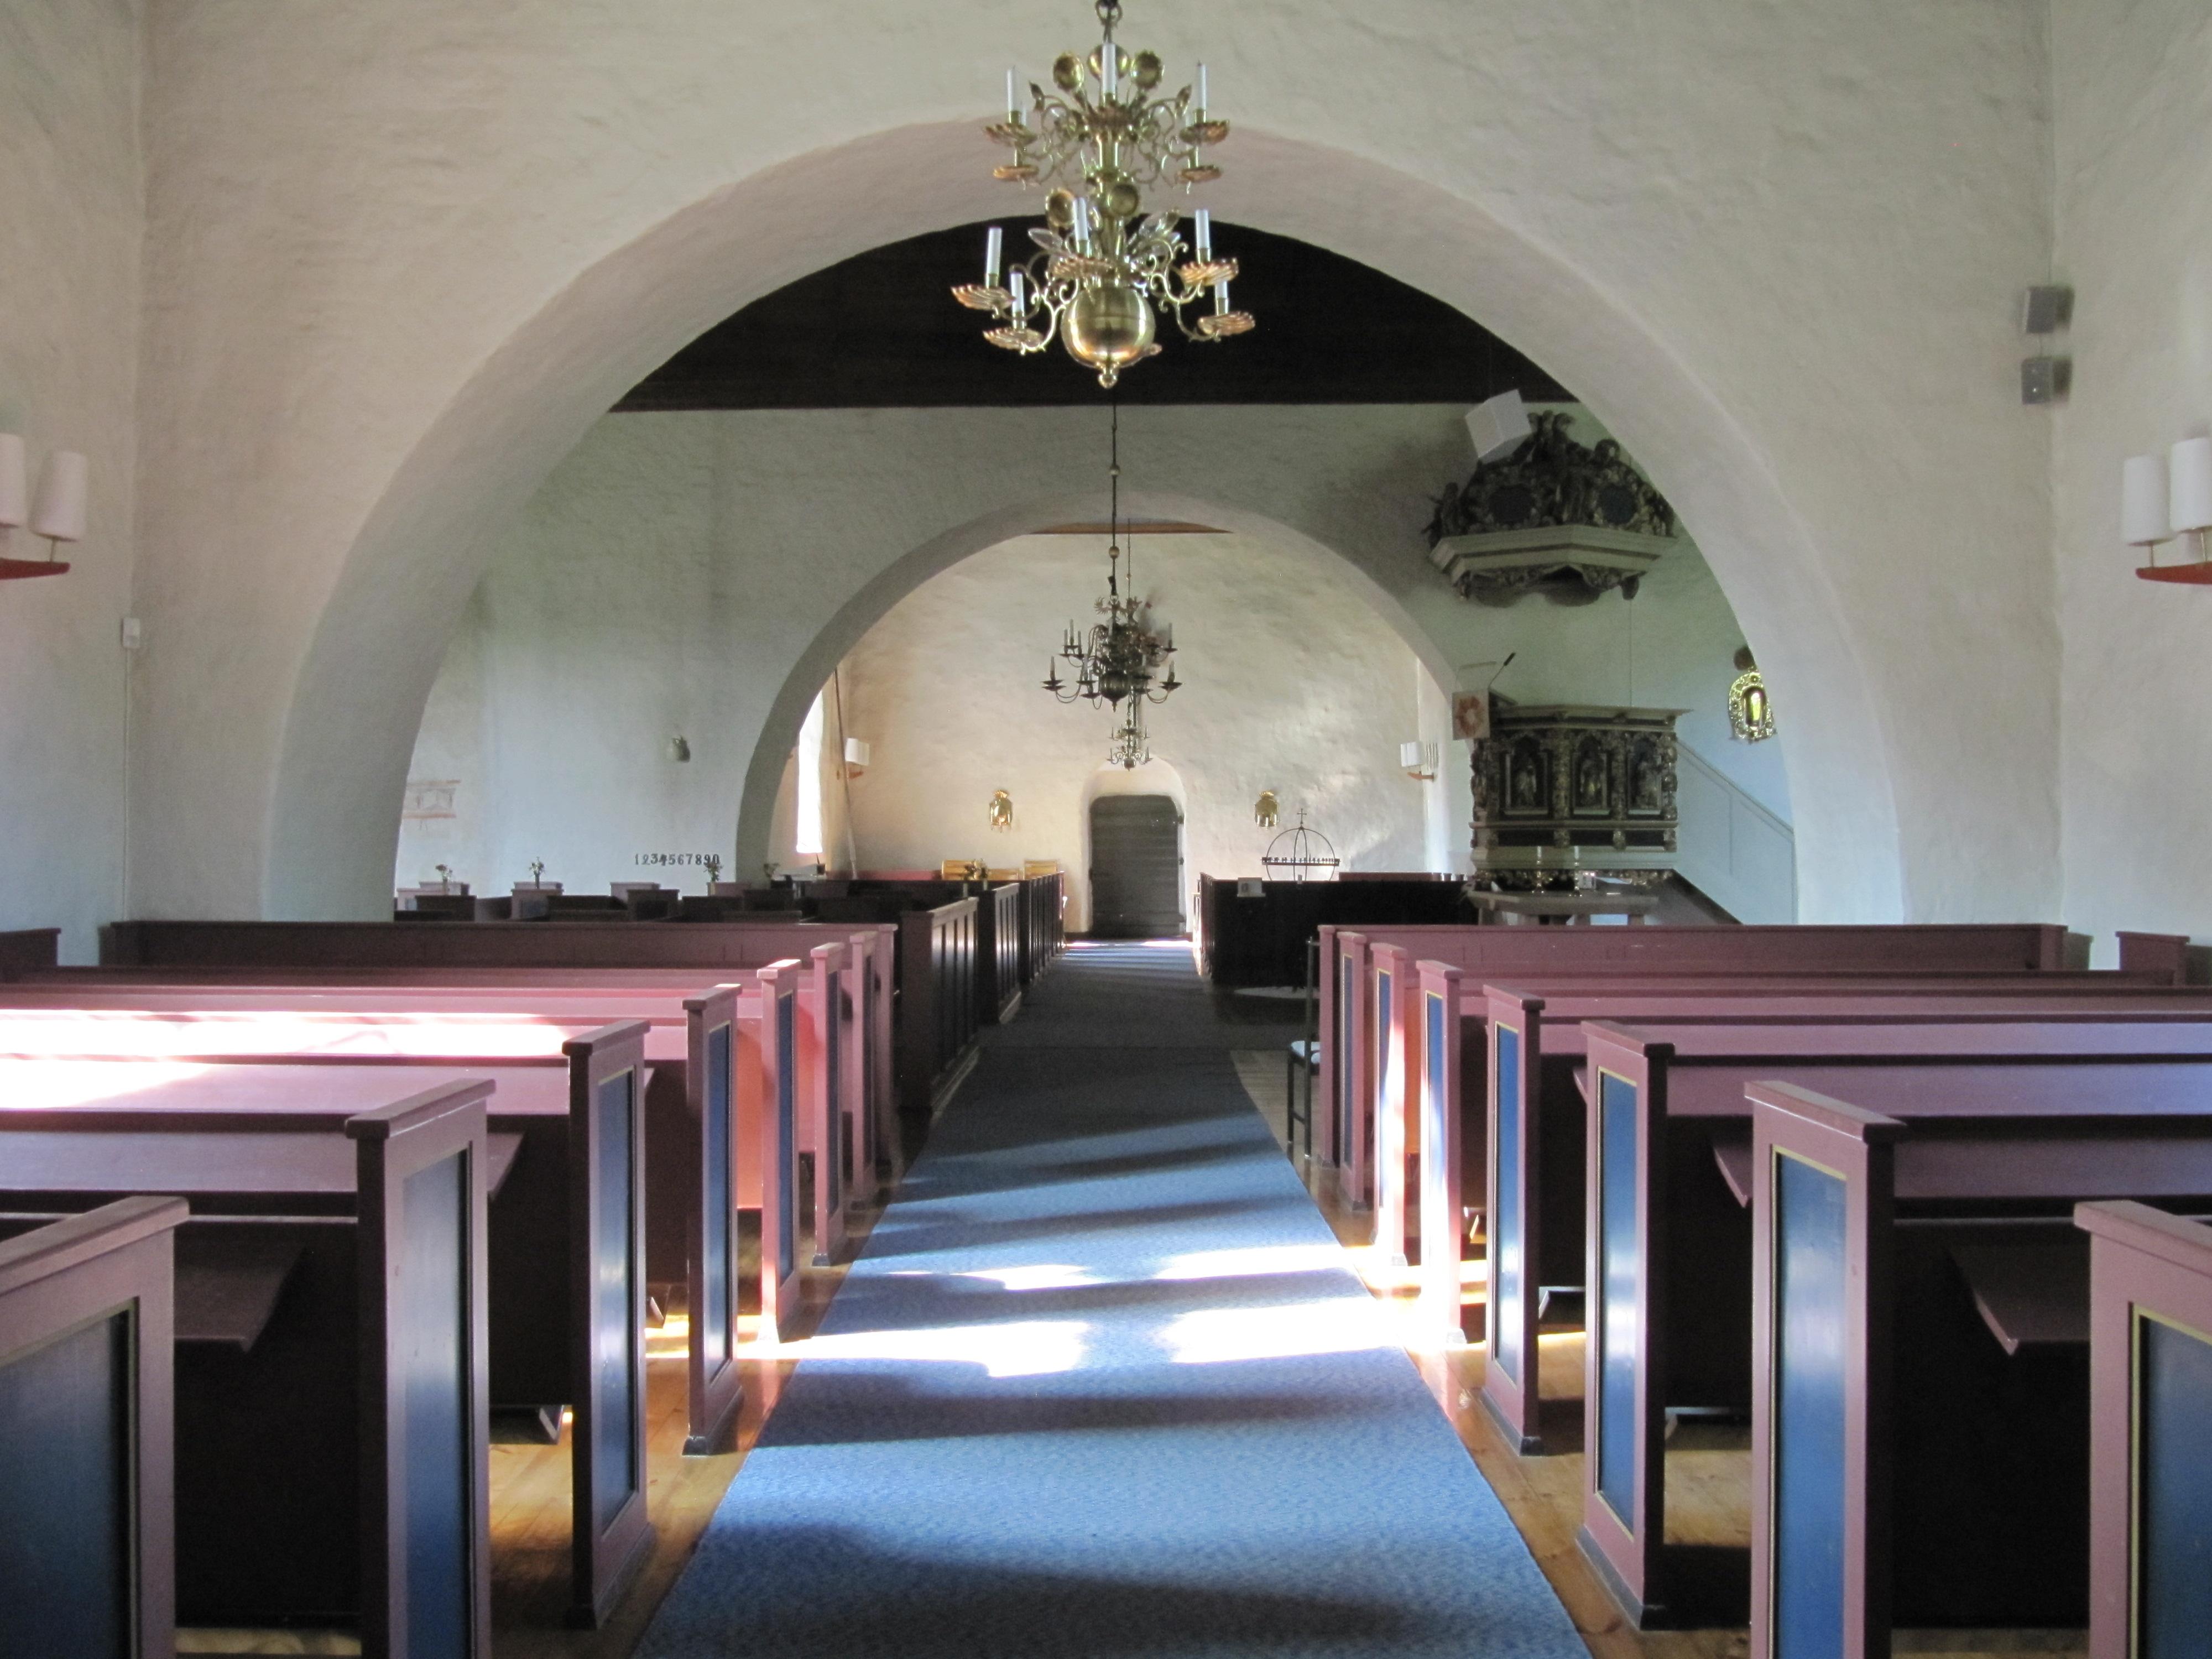 Byarums kyrka Kalkmlning, sdra vggen. Fre - Alamy